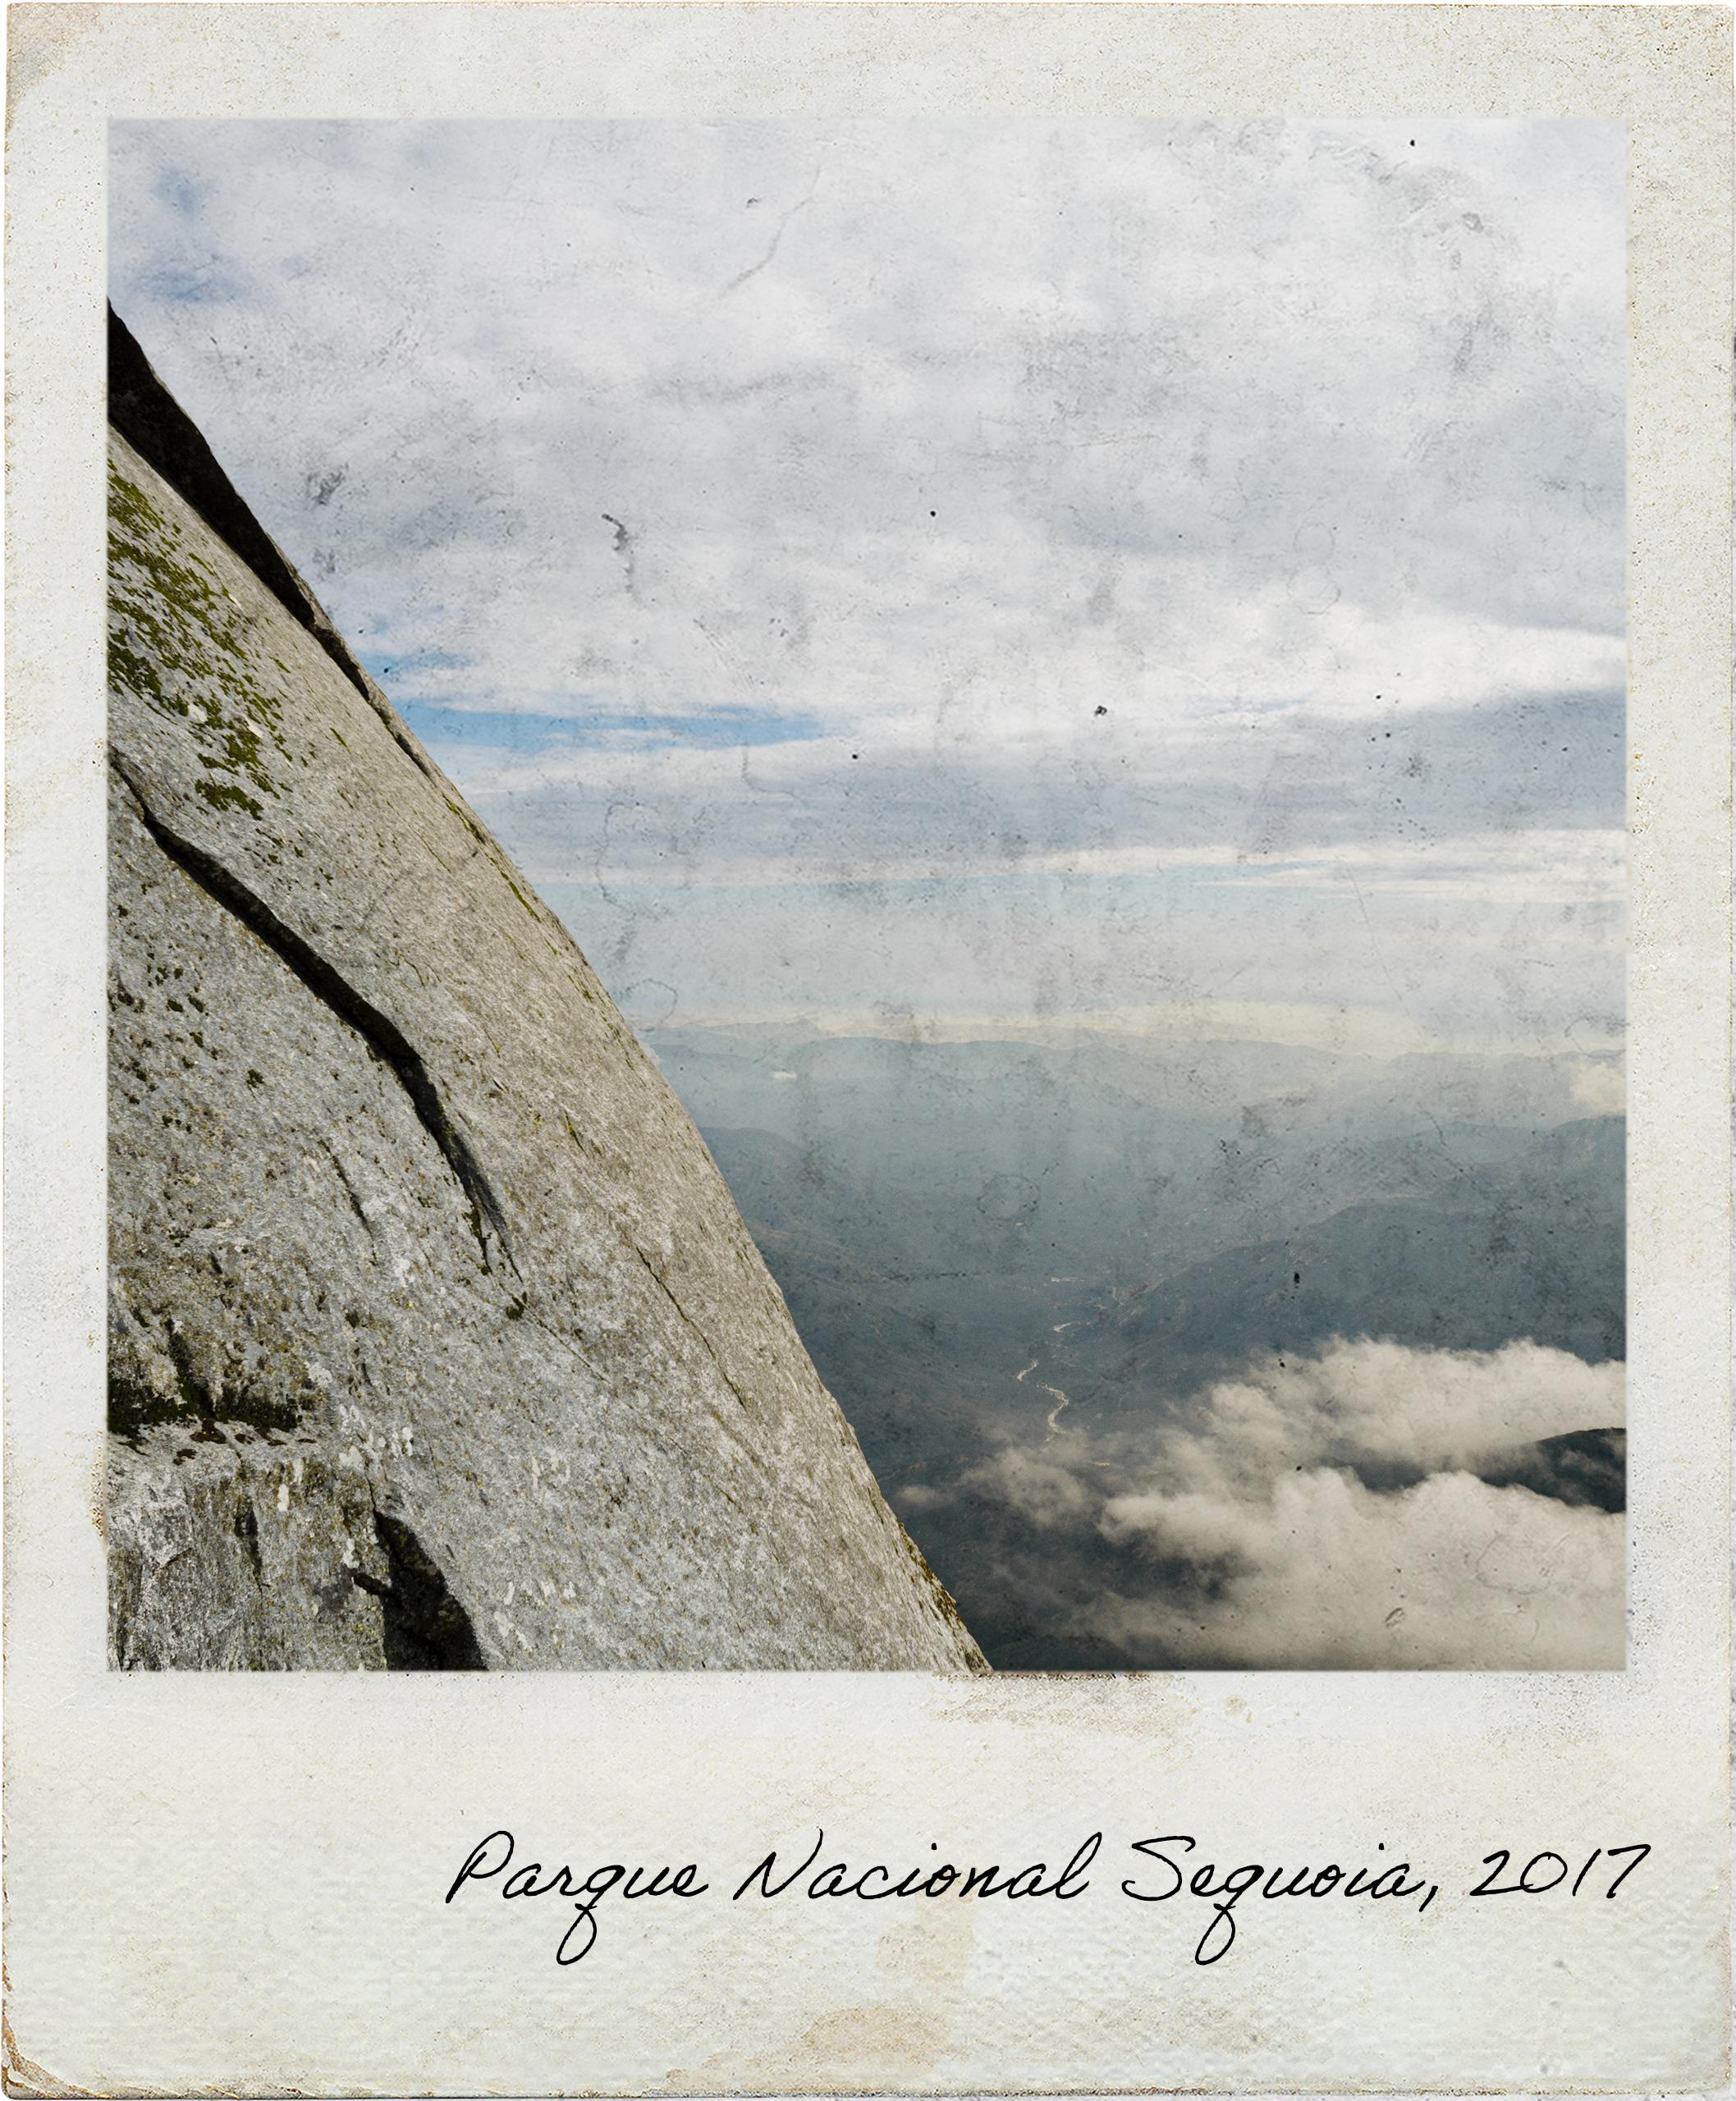 Vista da rocha Moro